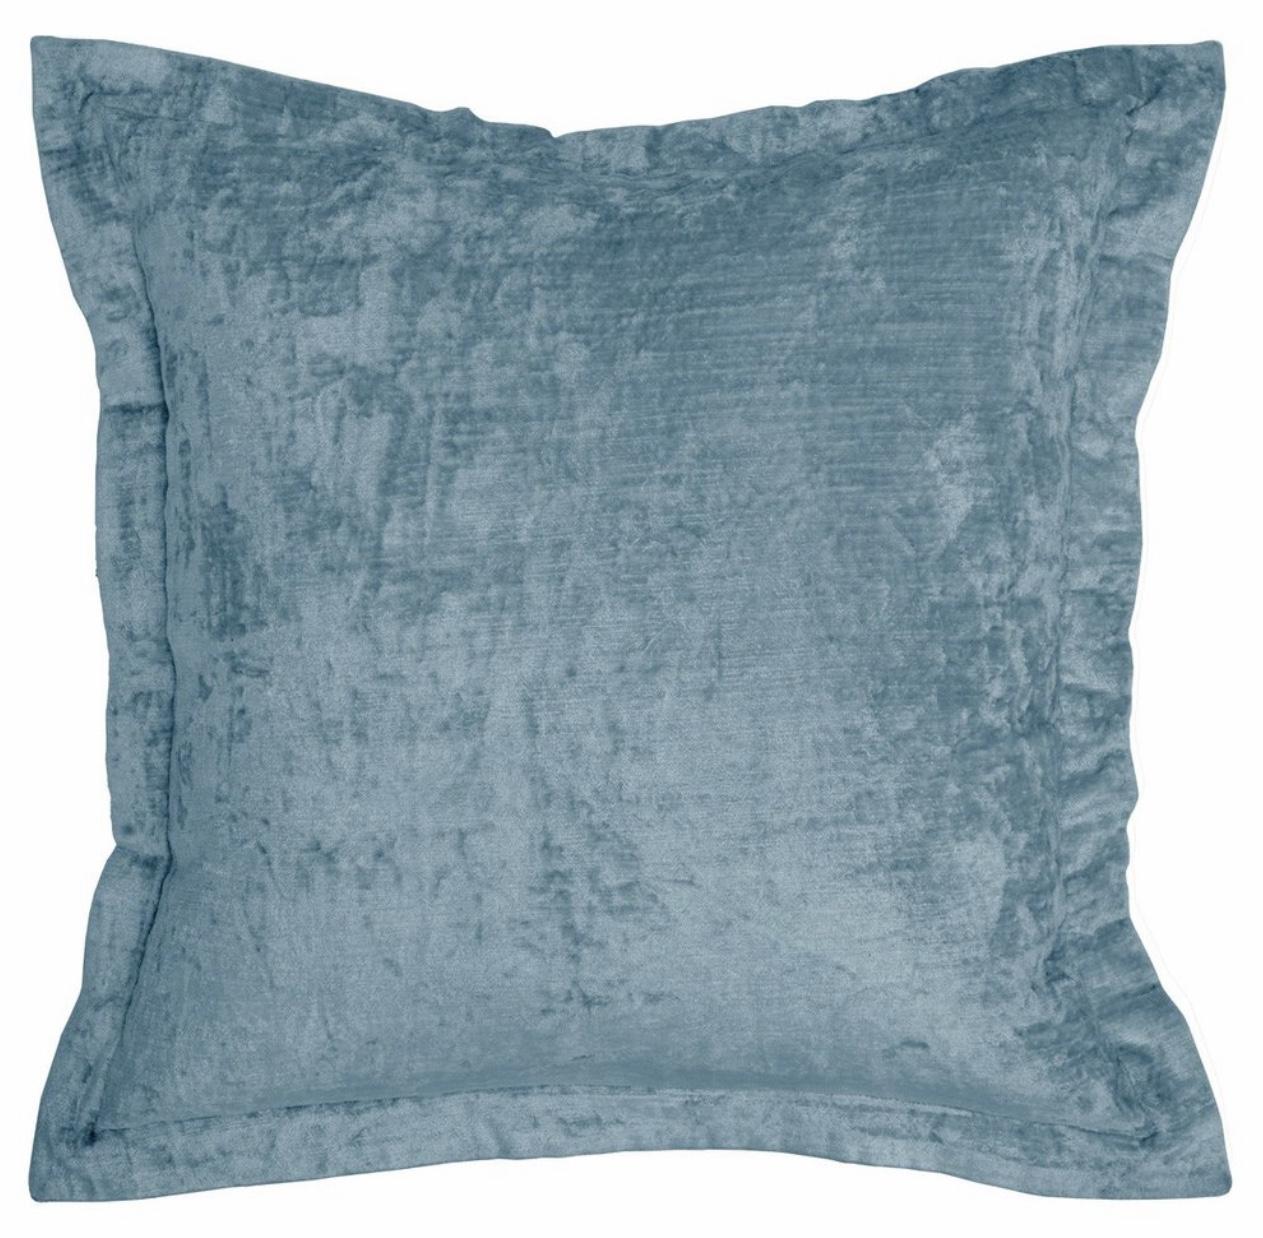 Lapis Marlin Blue Throw Pillow